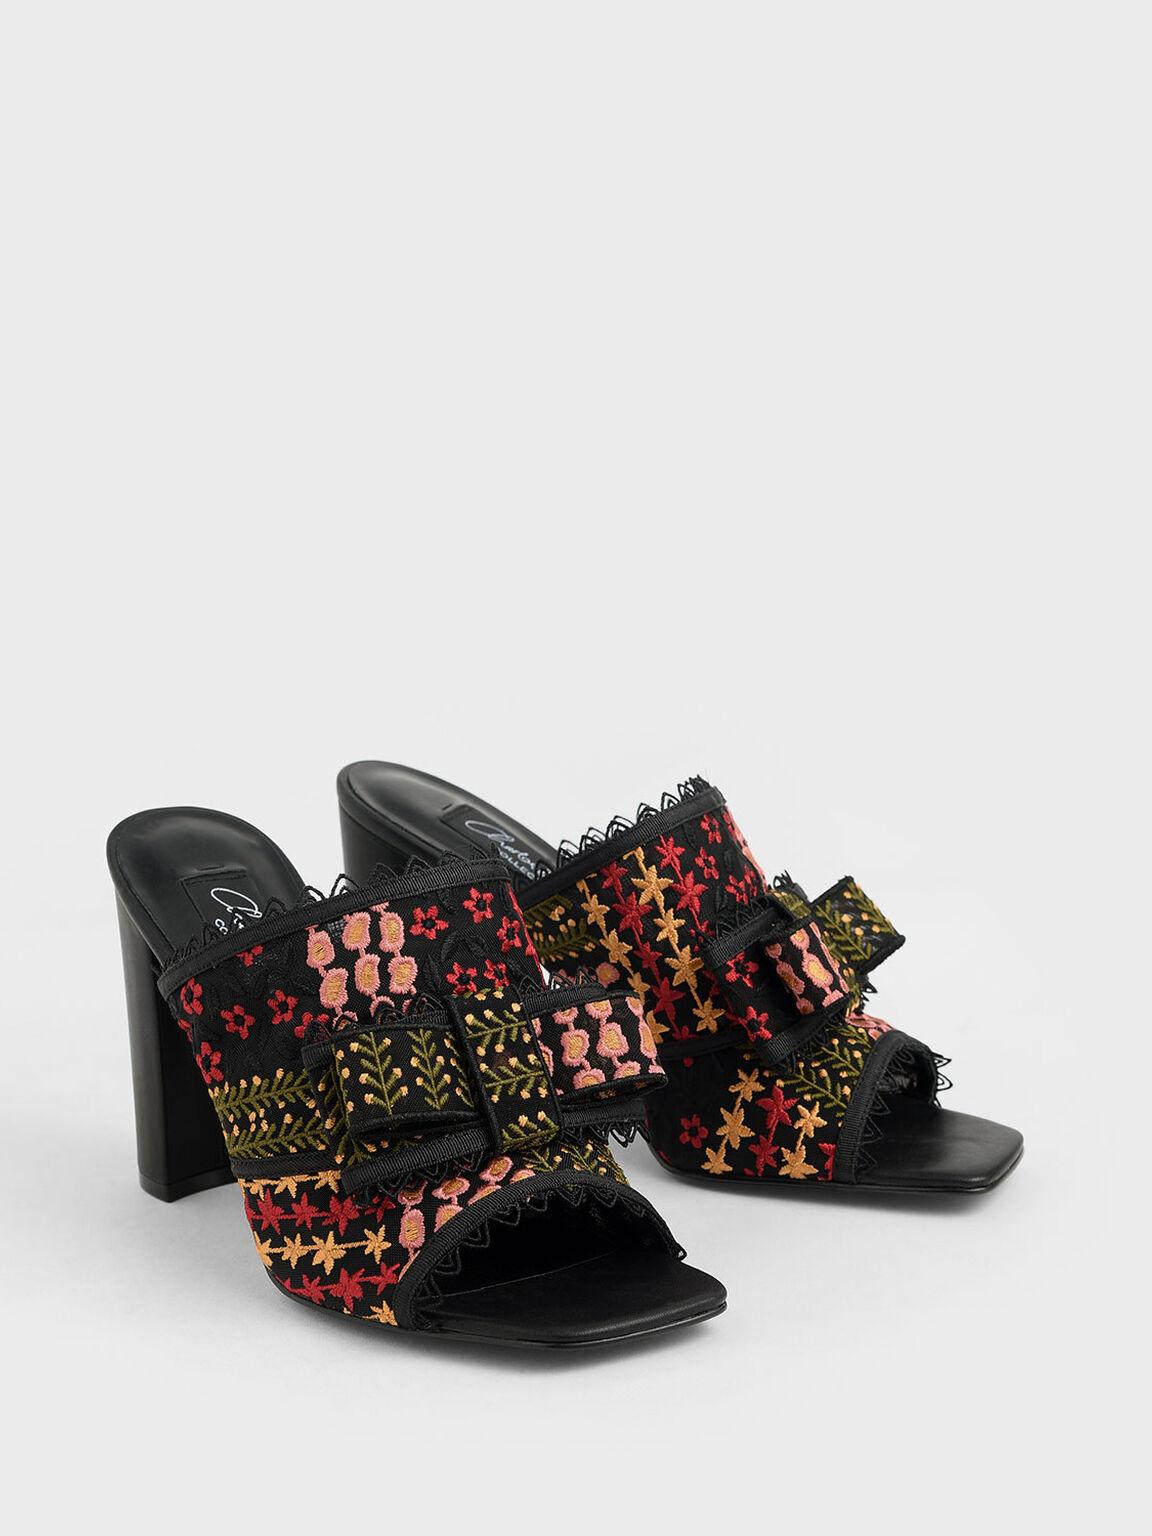 網紗蝴蝶結穆勒鞋, 混色, hi-res